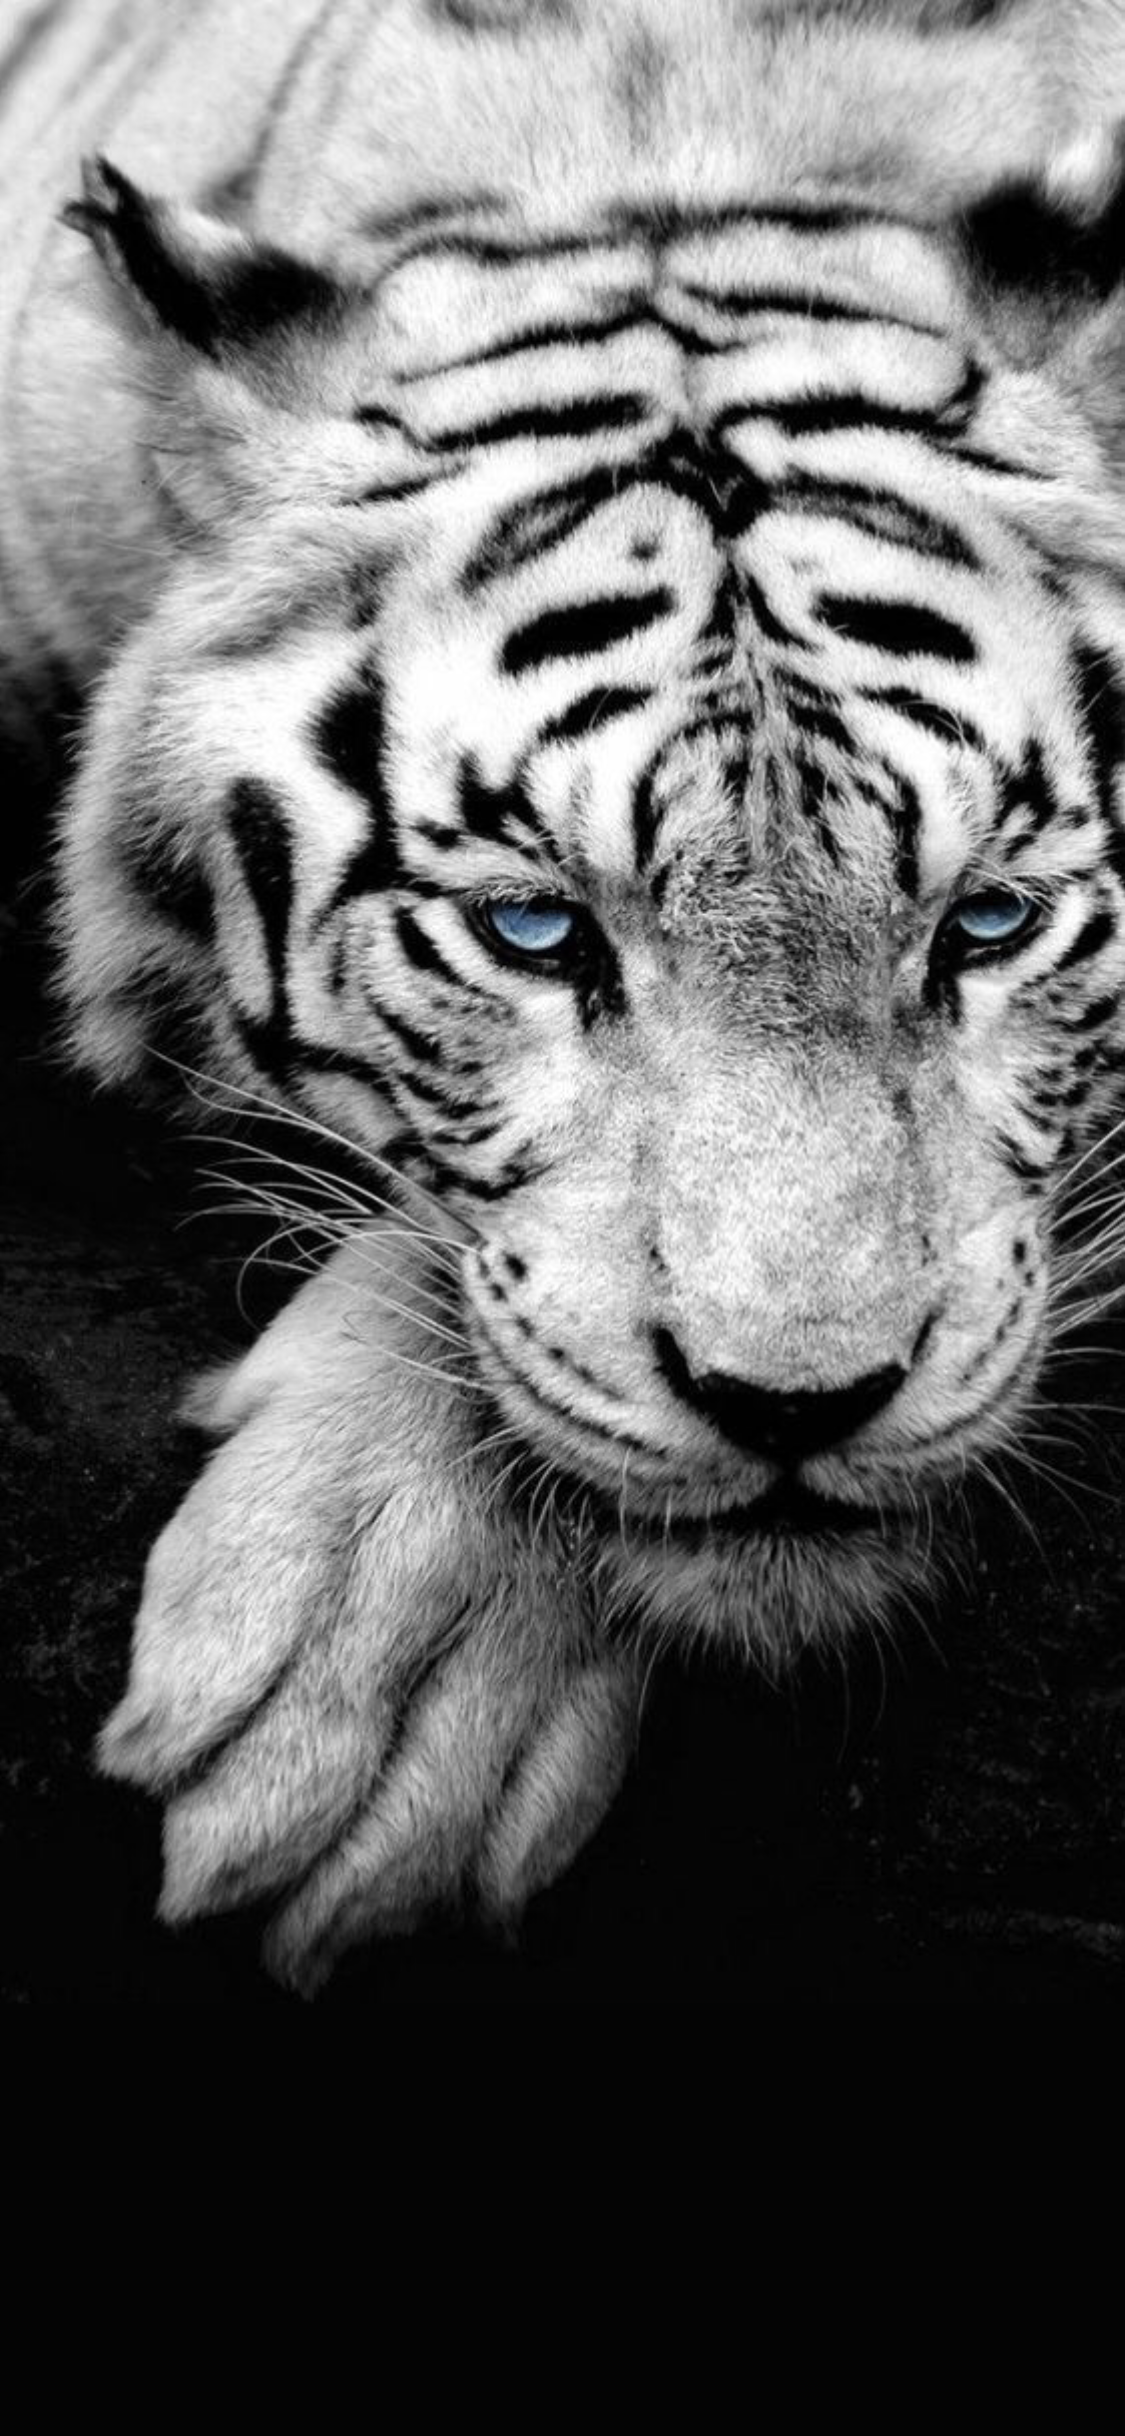 Wallpaper Iphone X In 2019 Wild Animal Wallpaper Tiger